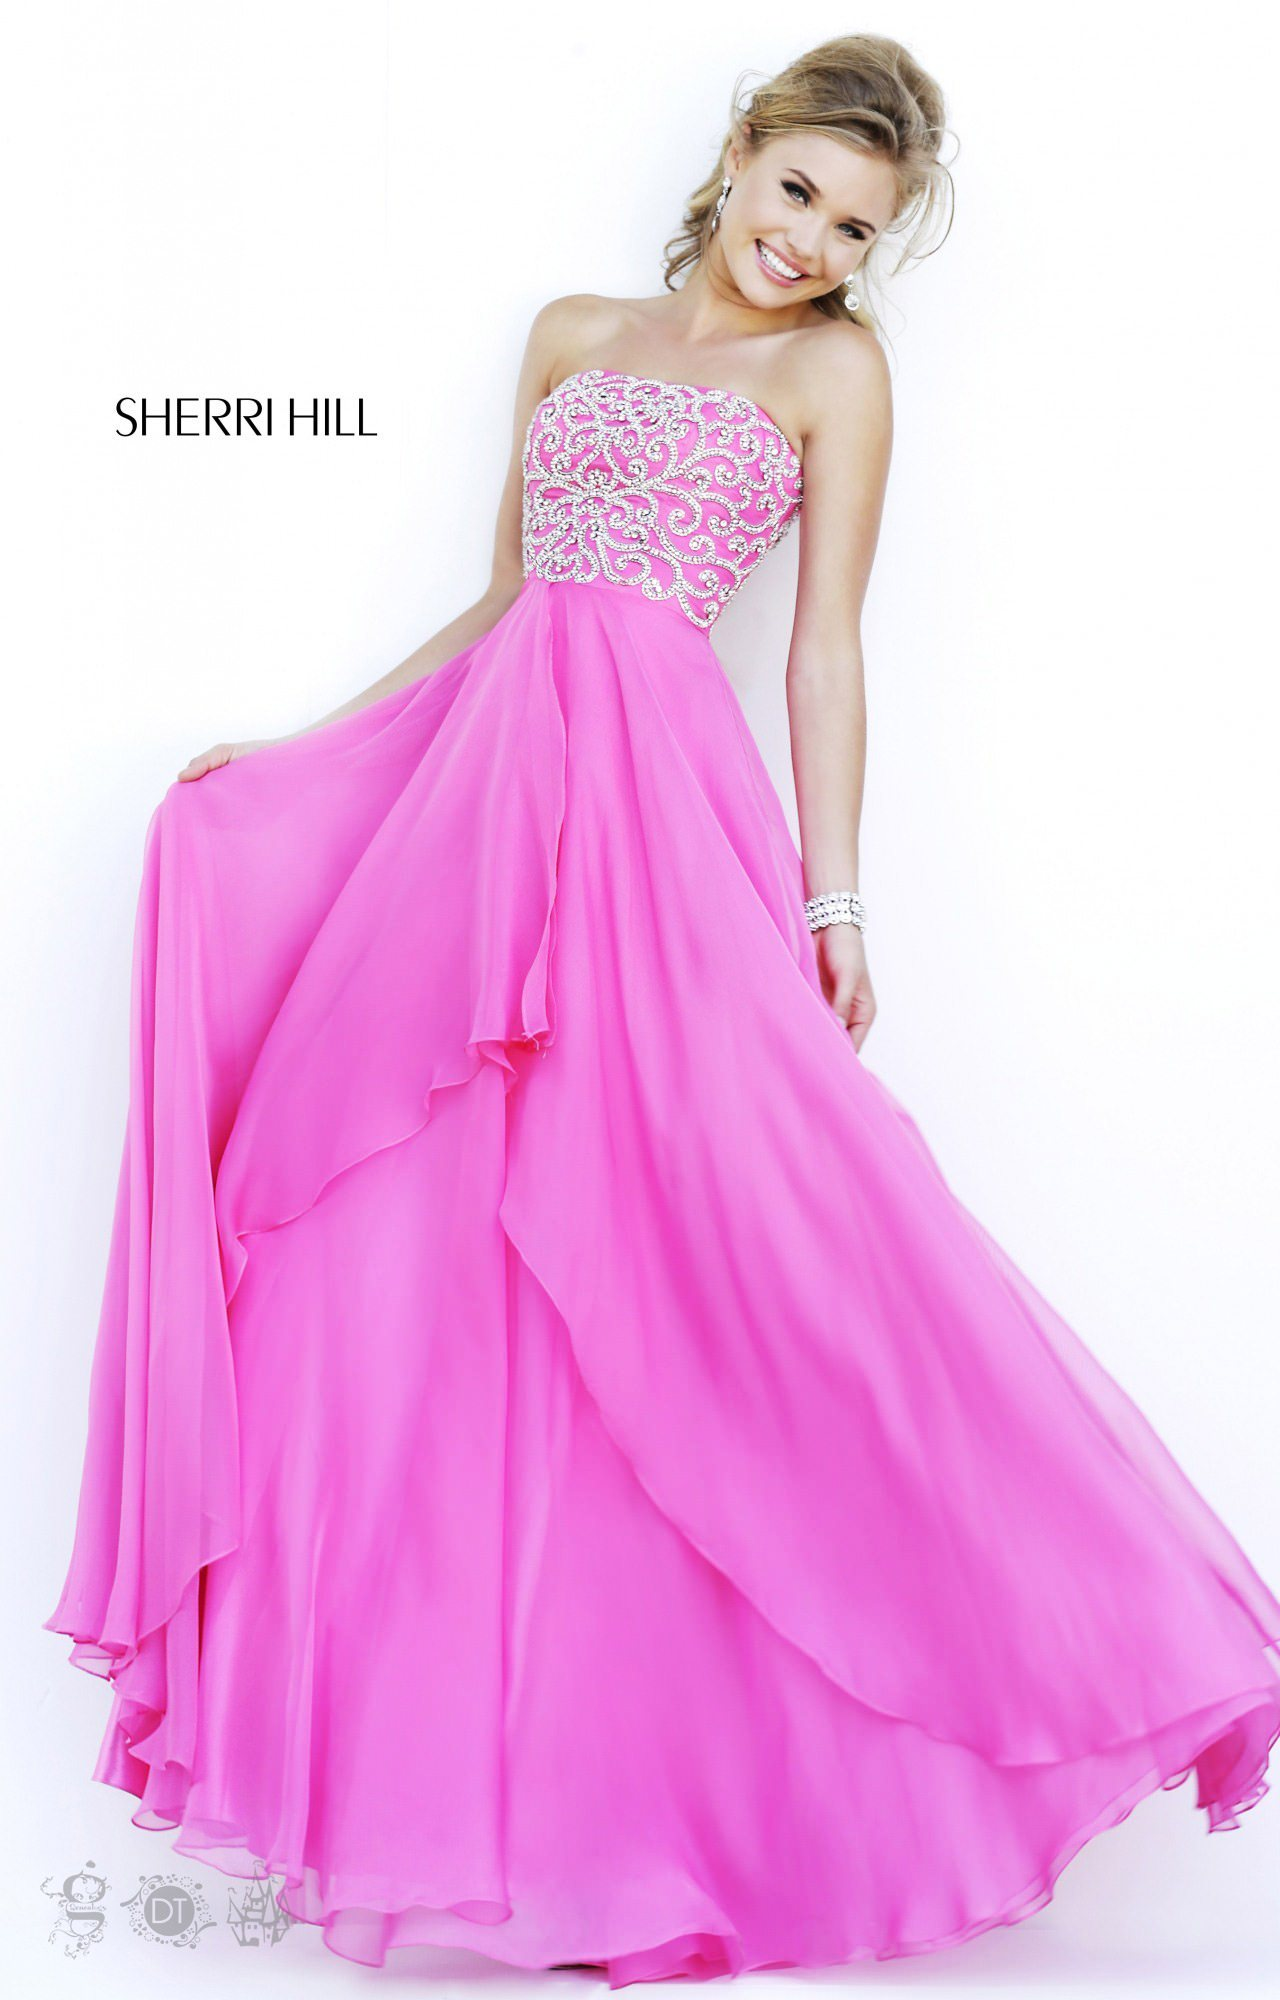 Sherri Hill 8554 - Leslie\'s Gown Prom Dress